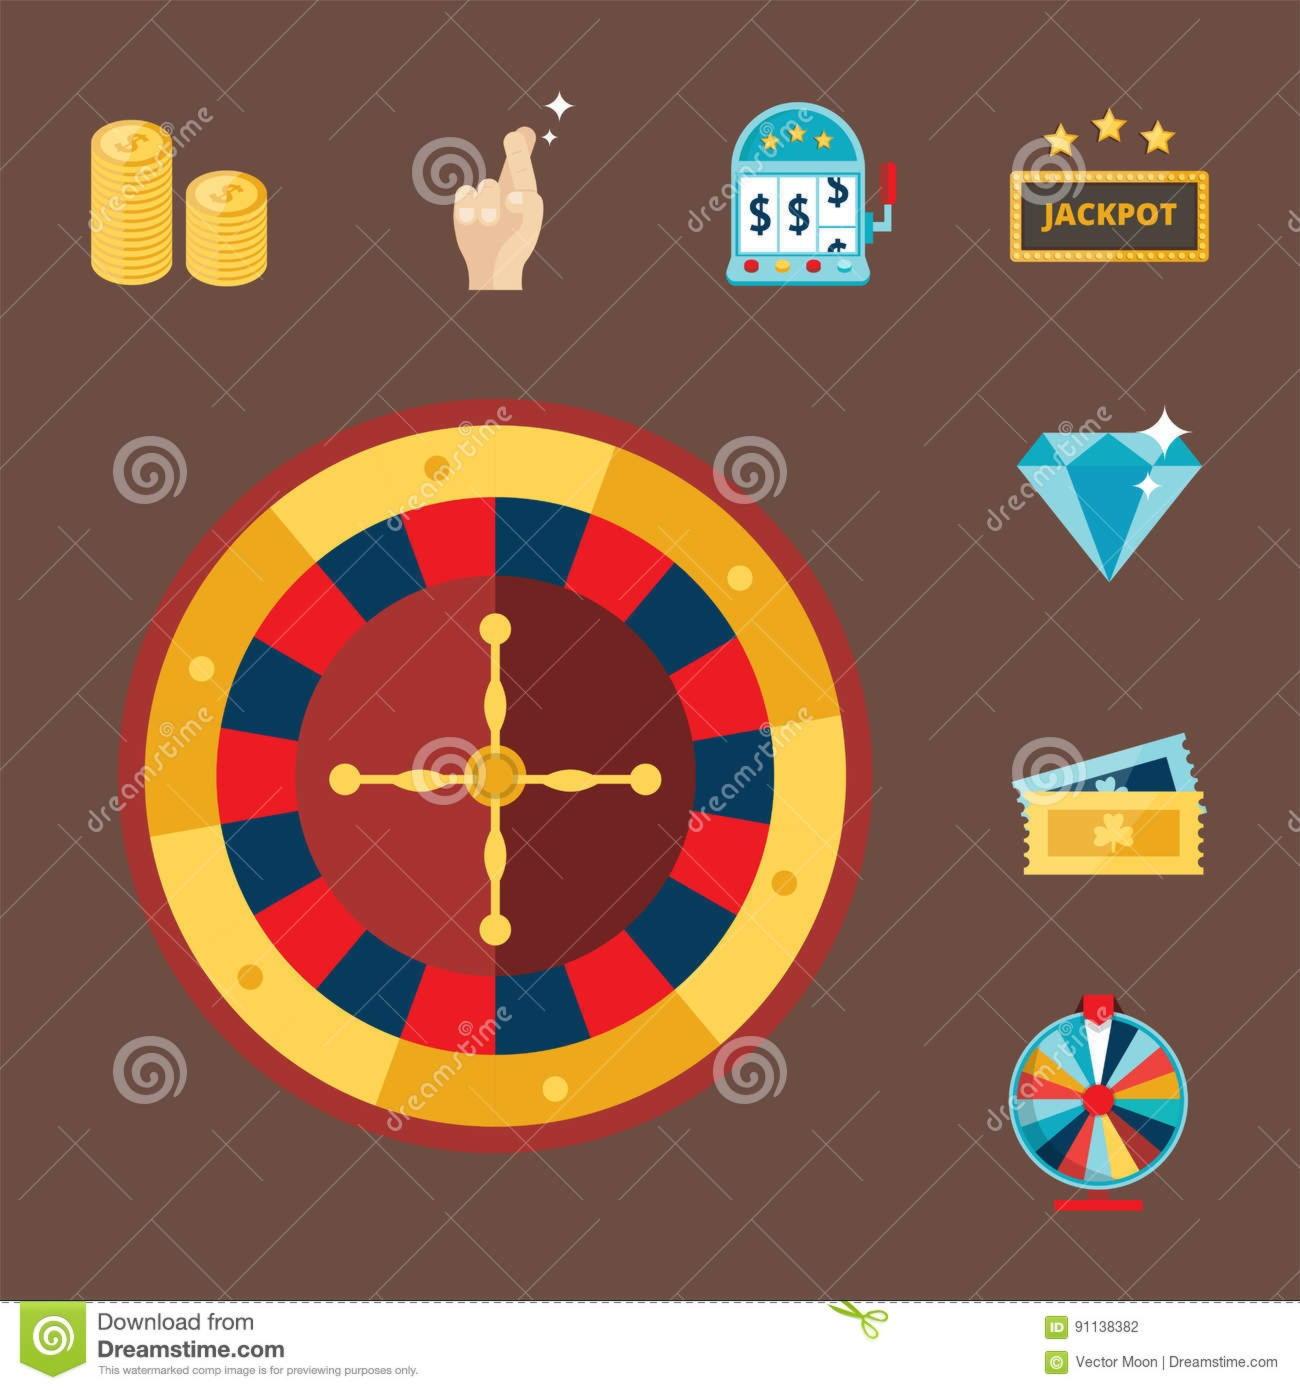 66 Free Spins núna á Wow Bingo